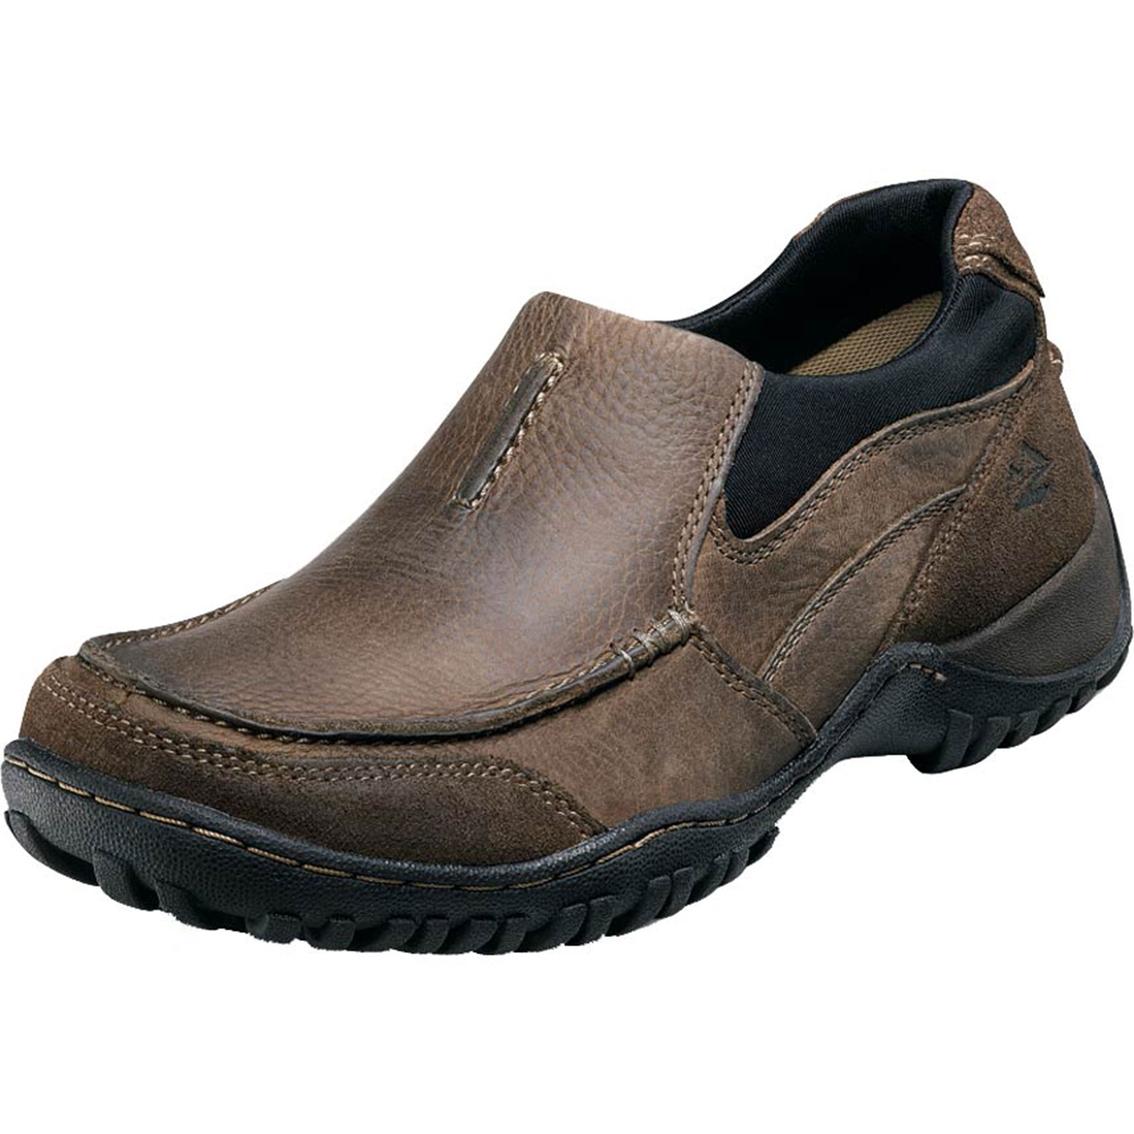 Nunn Bush Men S Portage All Terrain Slip On Shoes Casual